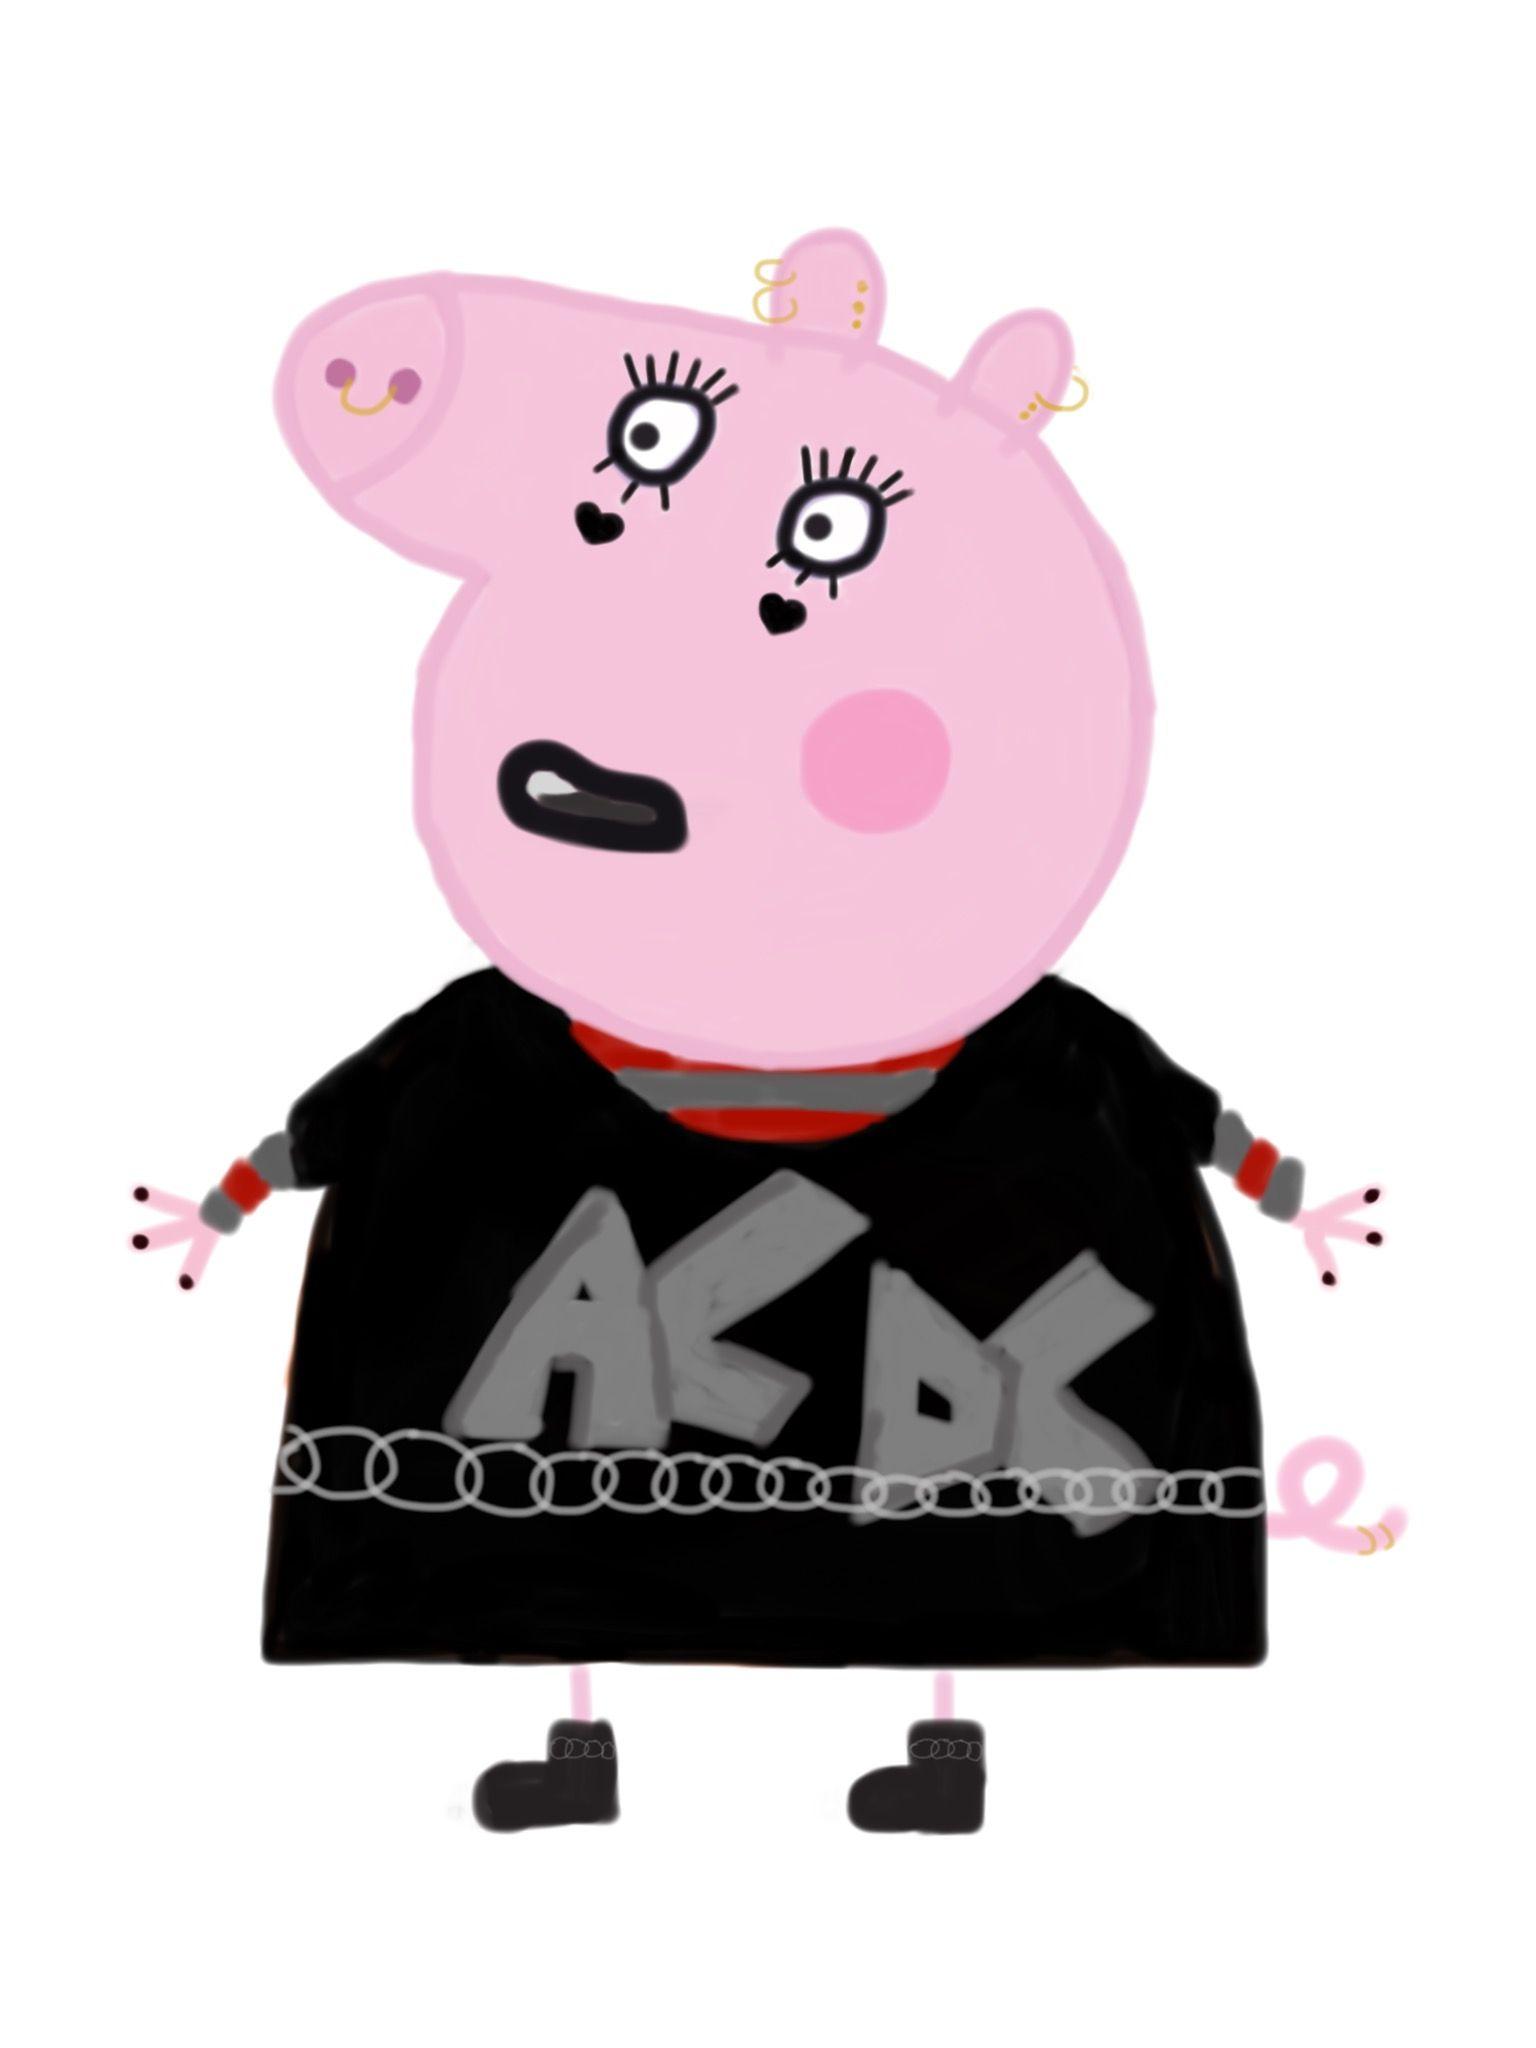 Xd Emo Noises Peppa Pig Memes Funny Iphone Wallpaper Ironic Memes